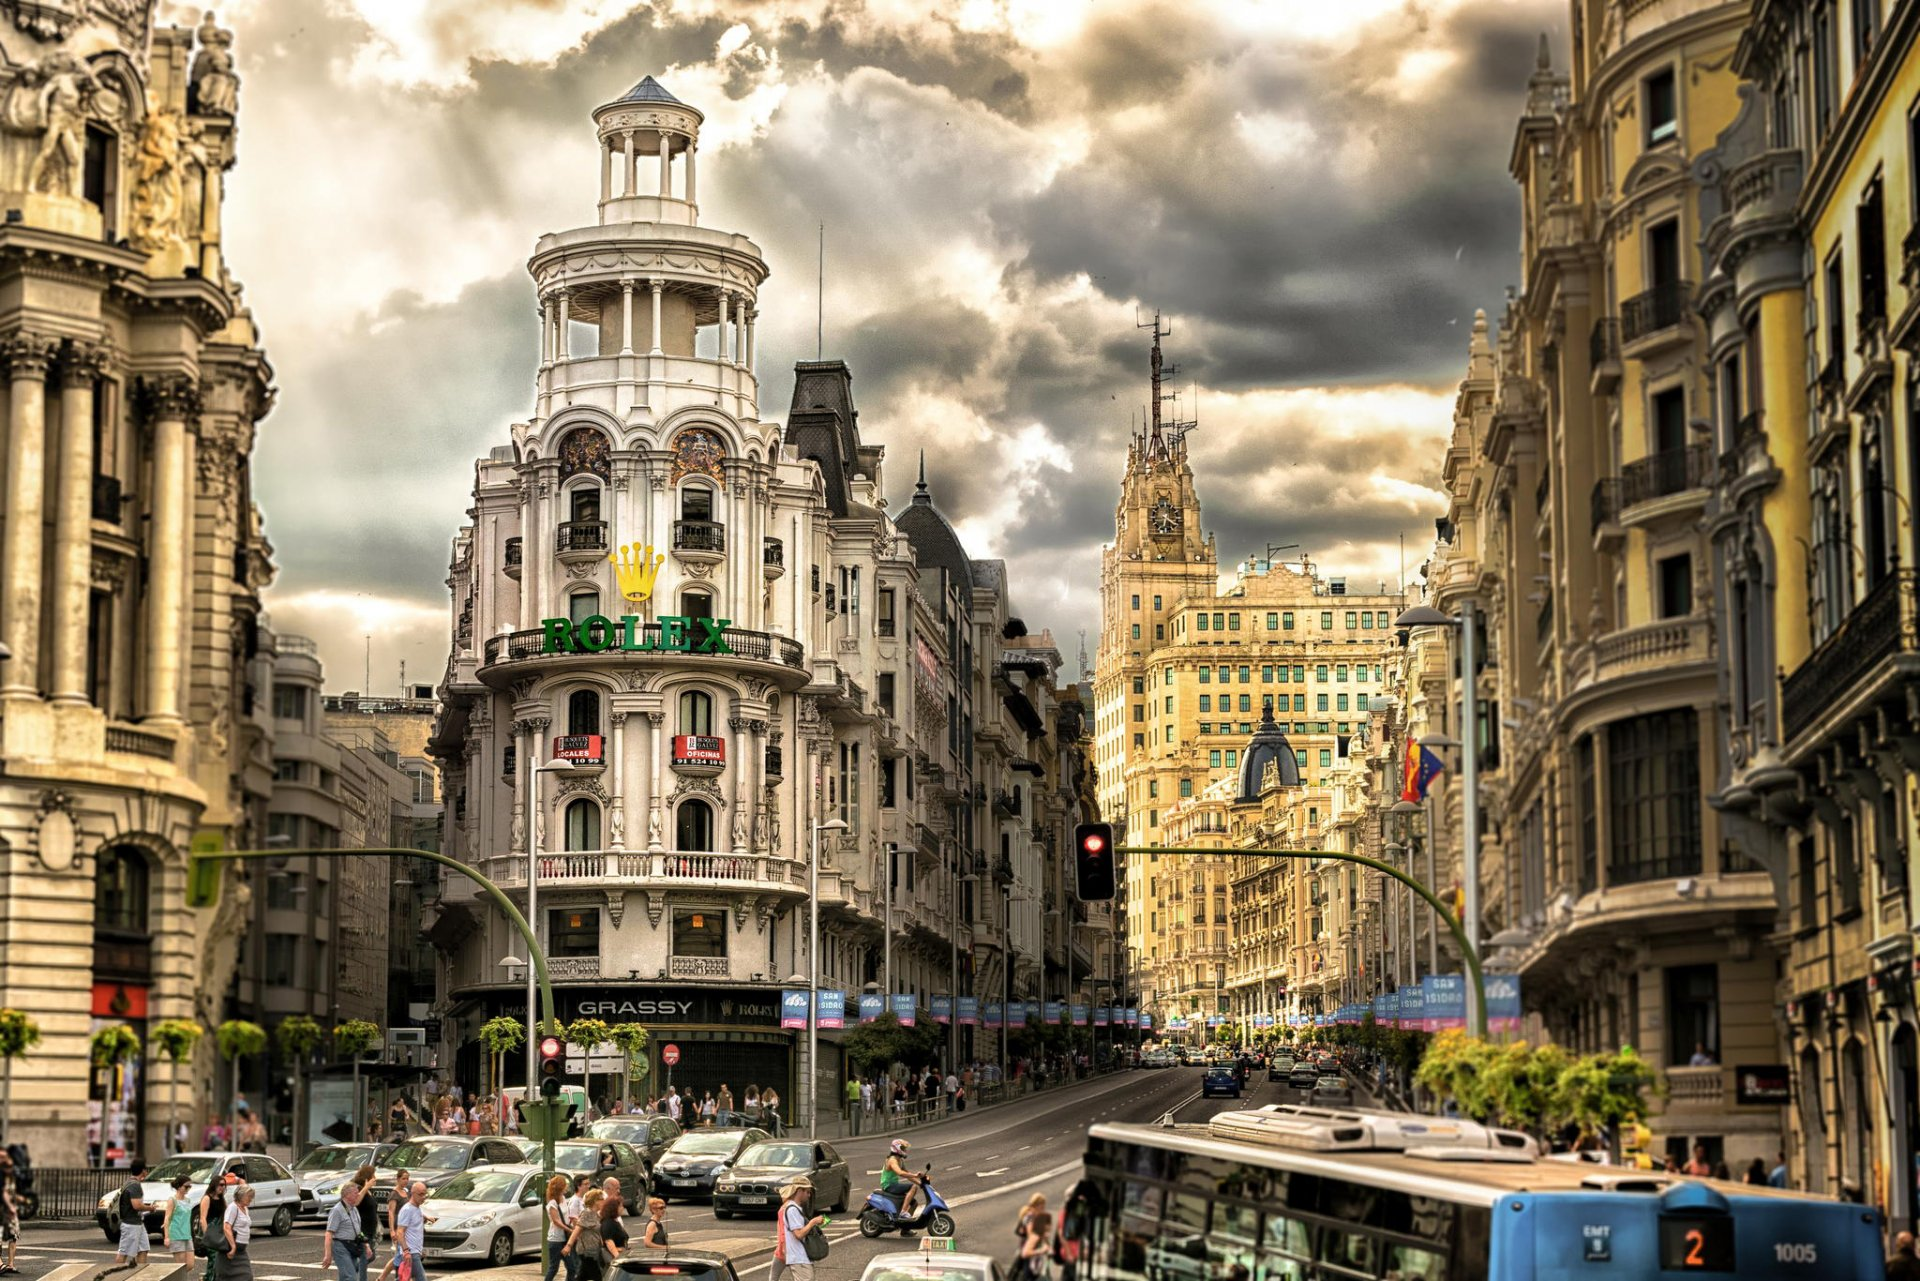 Qdq callejero fotografico madrid capital